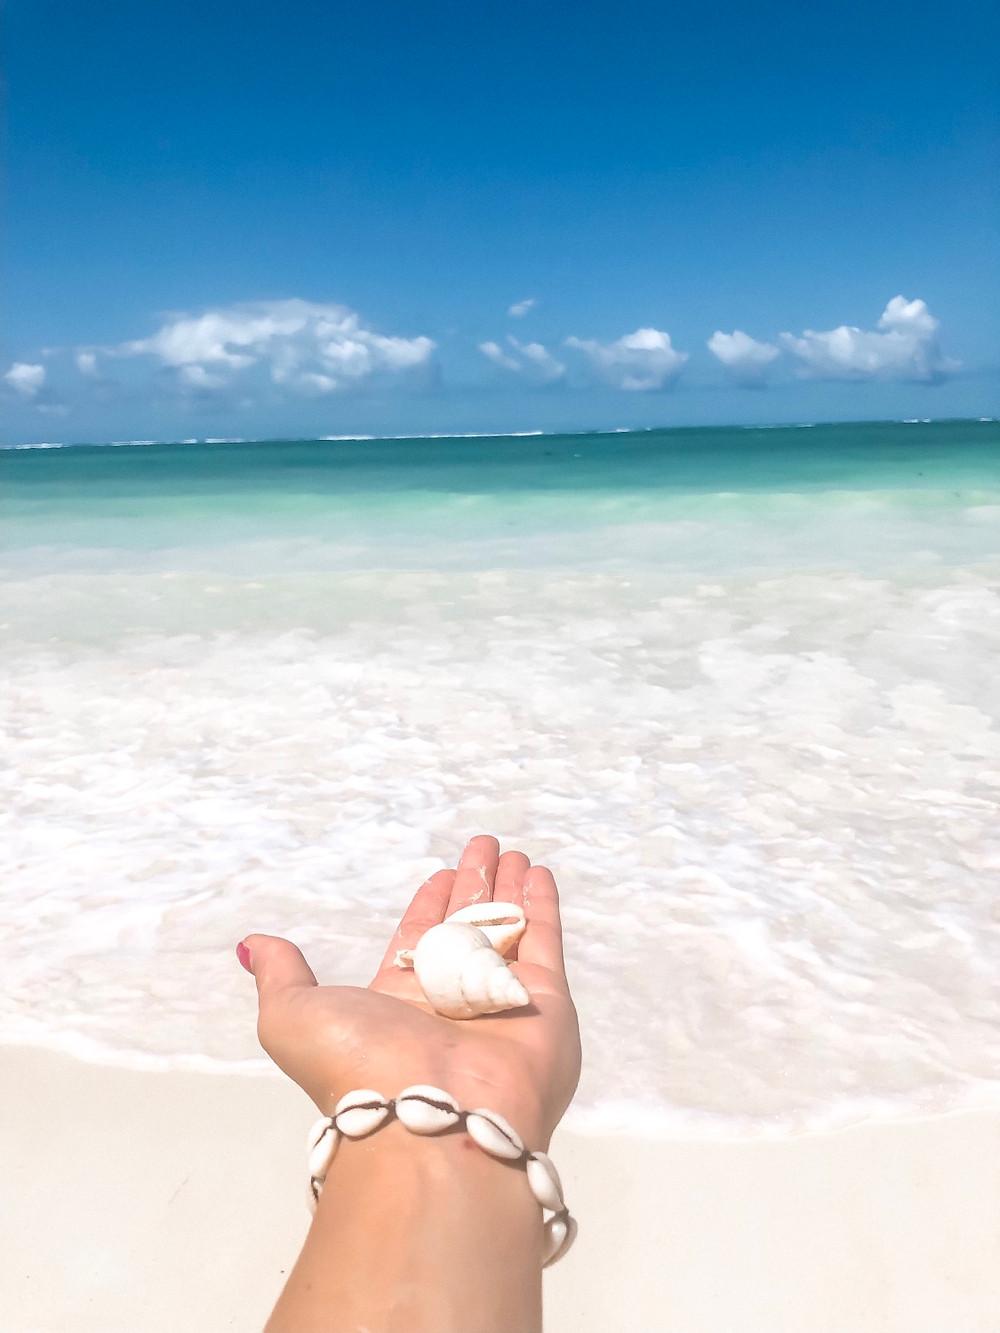 Diani-Beach-Reisebericht-Tipps-Strand-Kenia-Tauchen